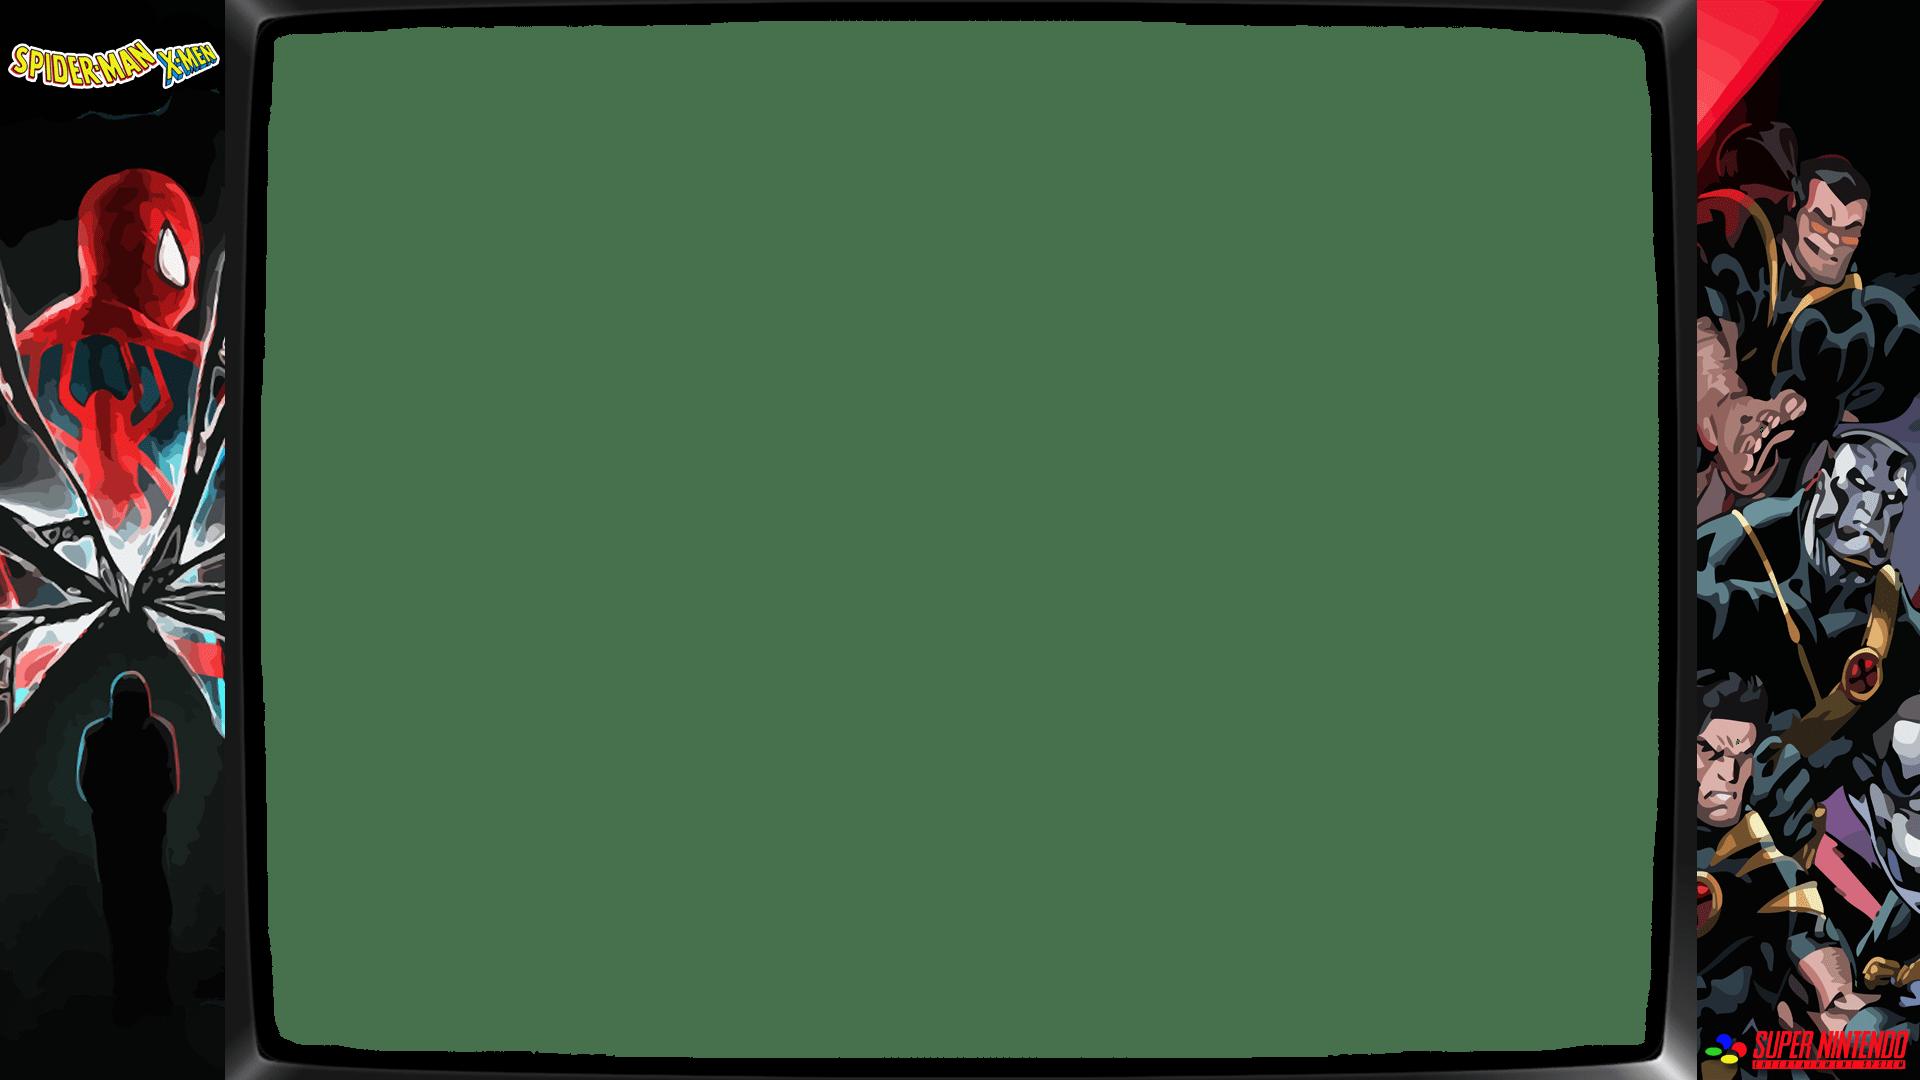 Bezel Project! A custom bezel for every ROM! - Game Media